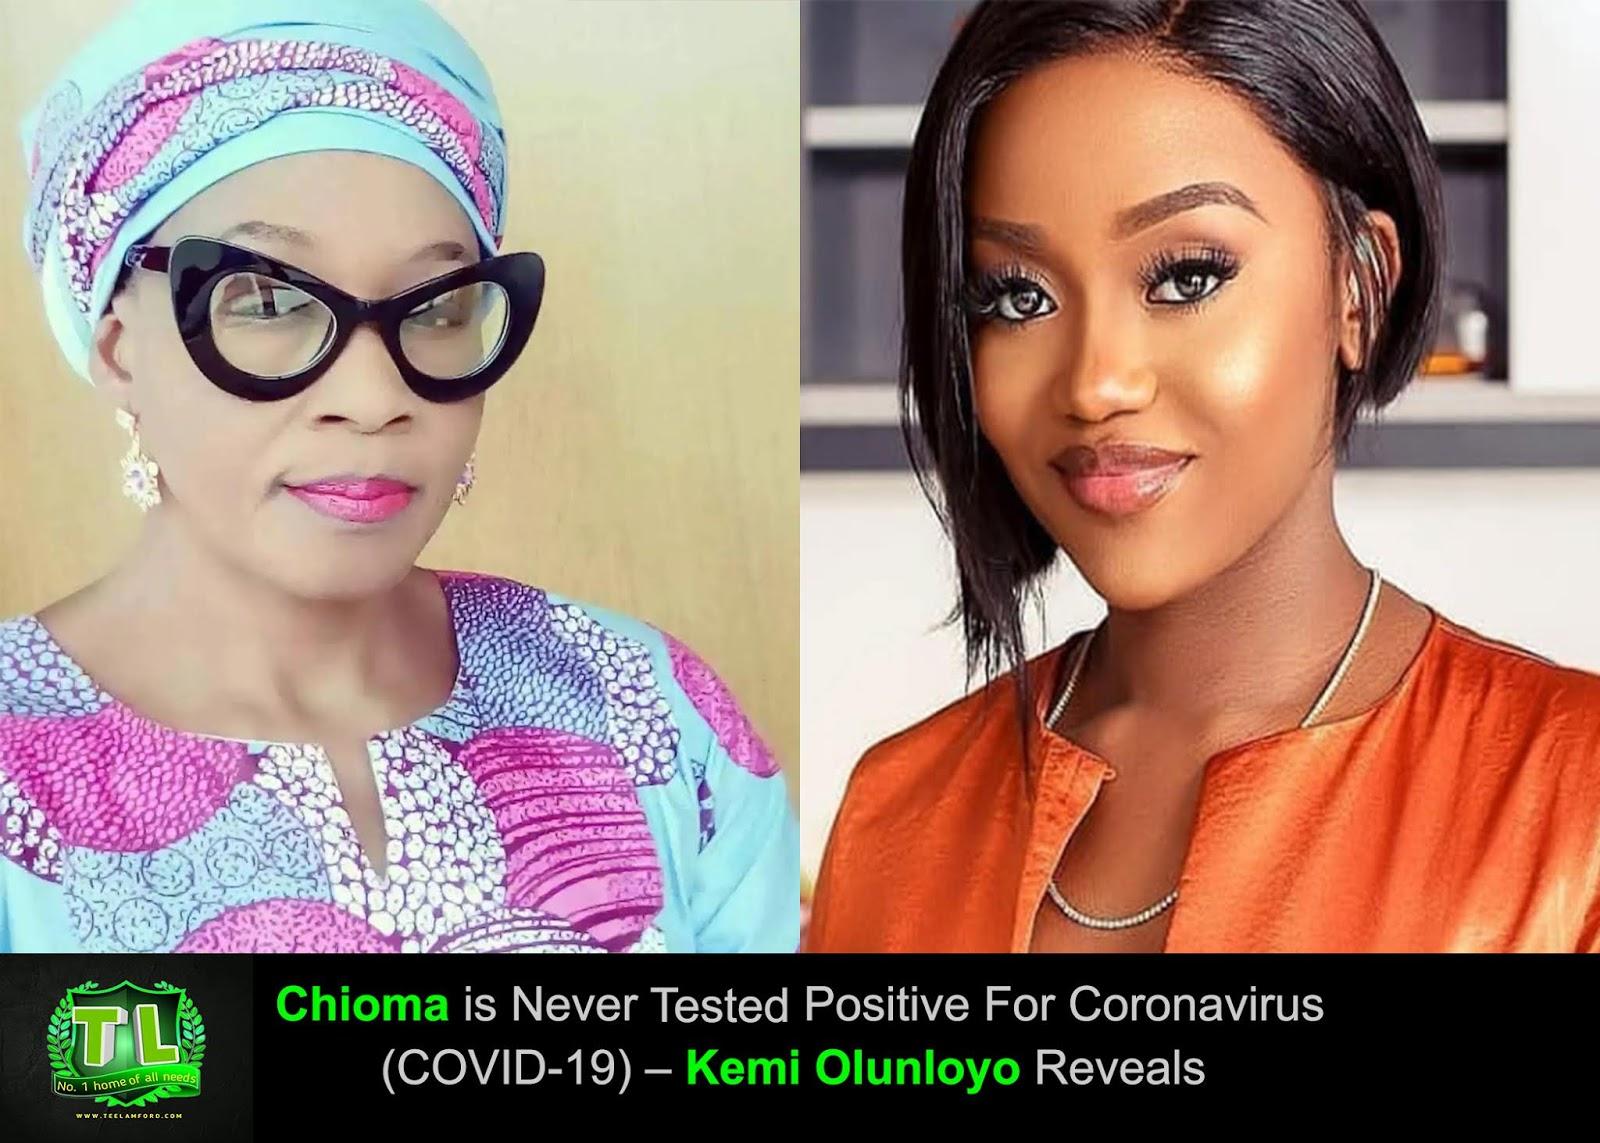 chioma-is-never-tested-positive-for-coronavirus-covid-19-kemi-olunloyo-reveals